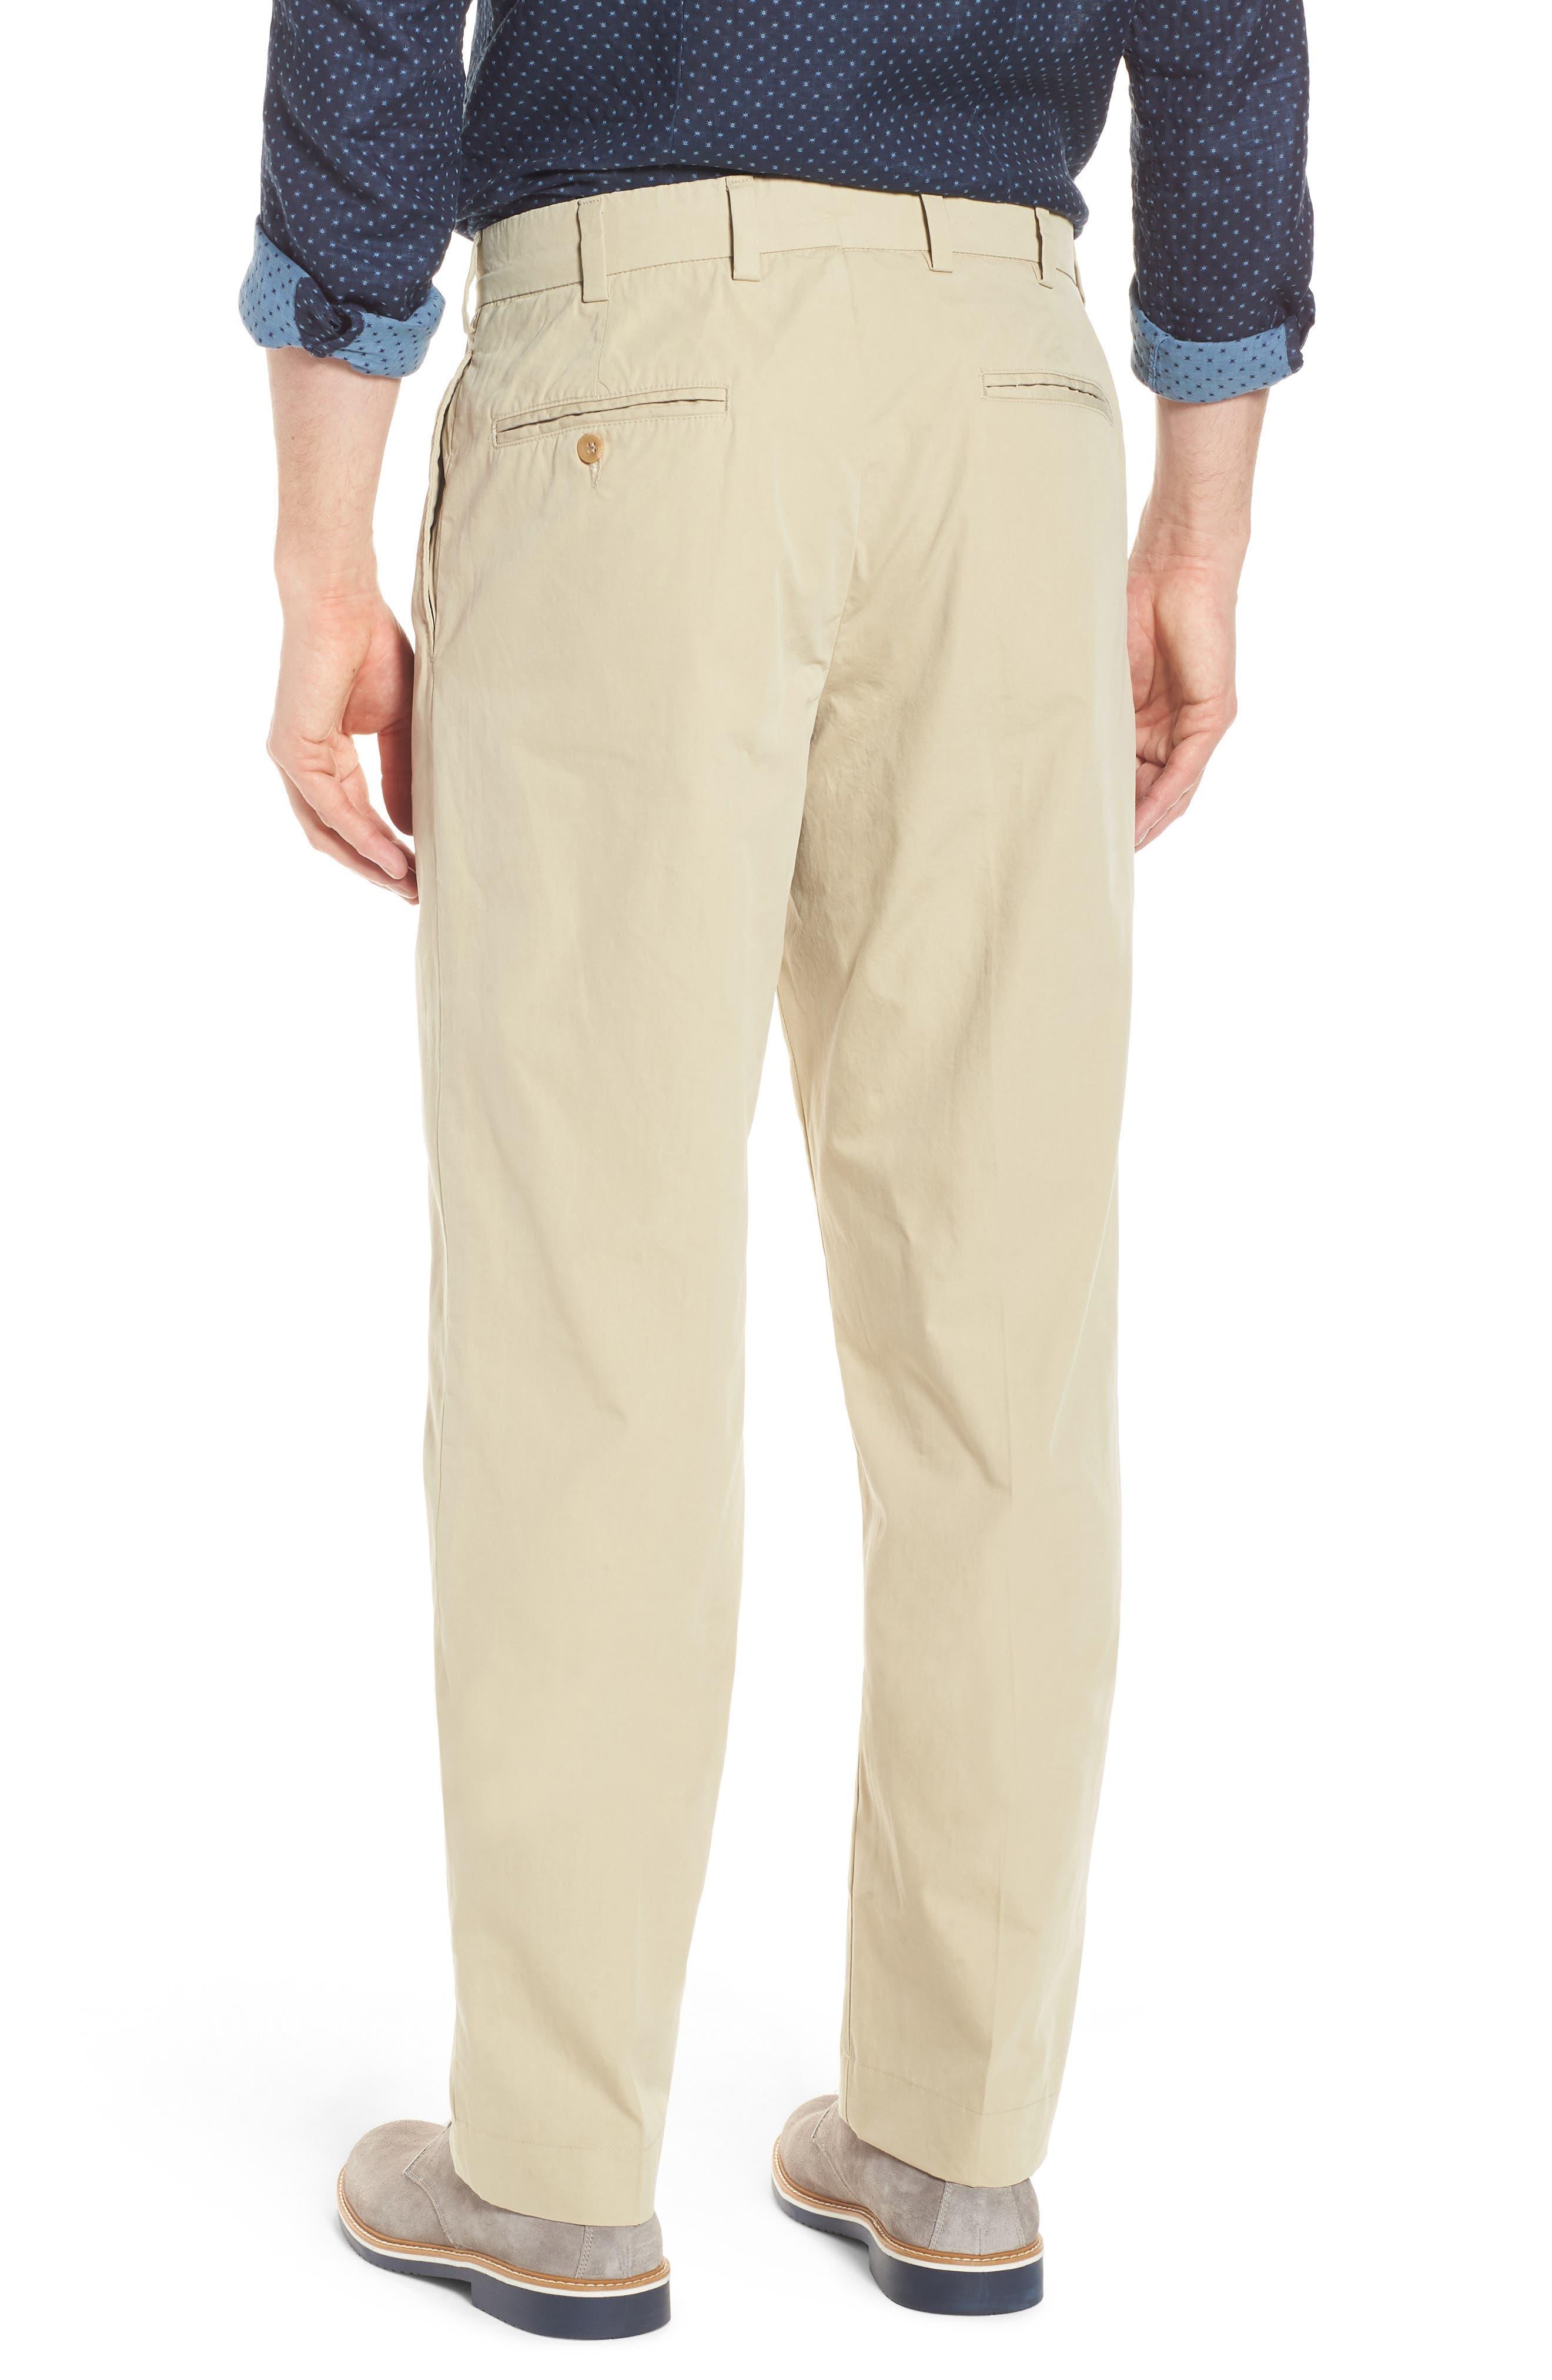 M2 Classic Fit Pleated Tropical Cotton Poplin Pants,                             Alternate thumbnail 2, color,                             Khaki